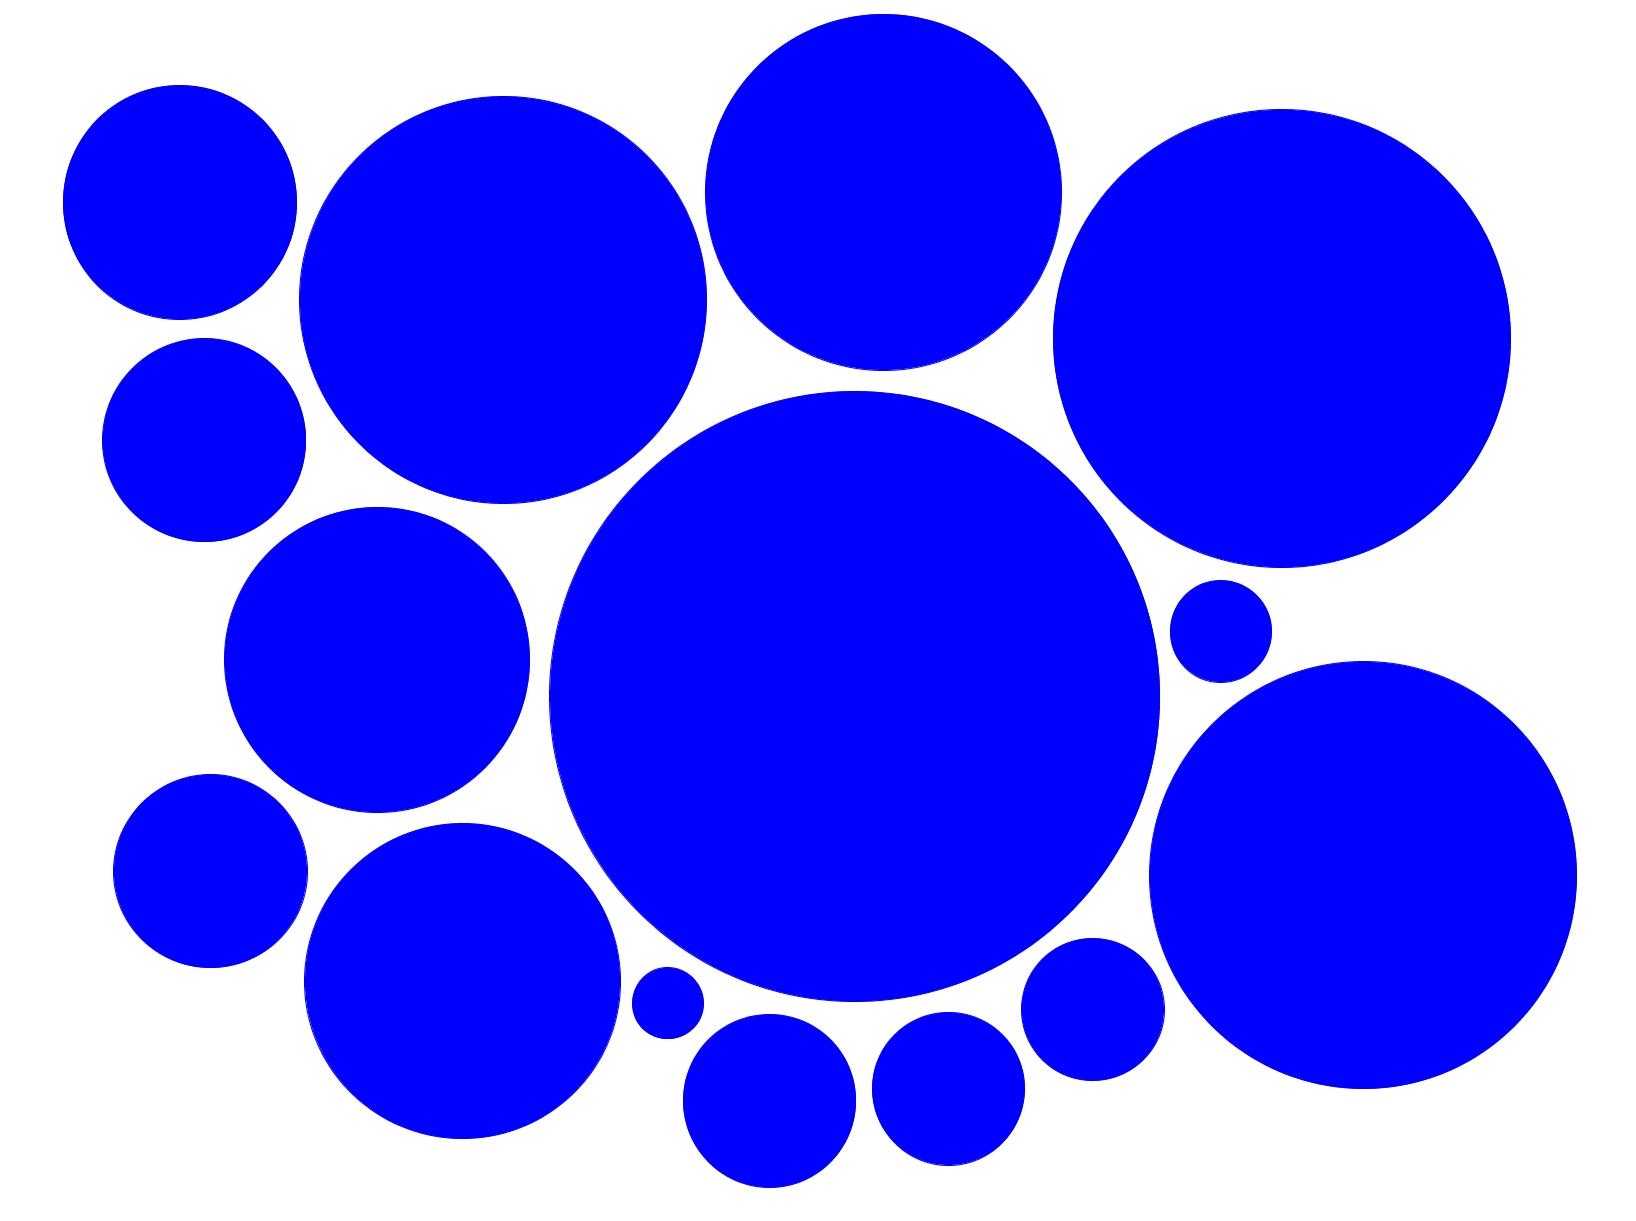 1636x1221 Congruence And Similarity Of Circles Mathspace